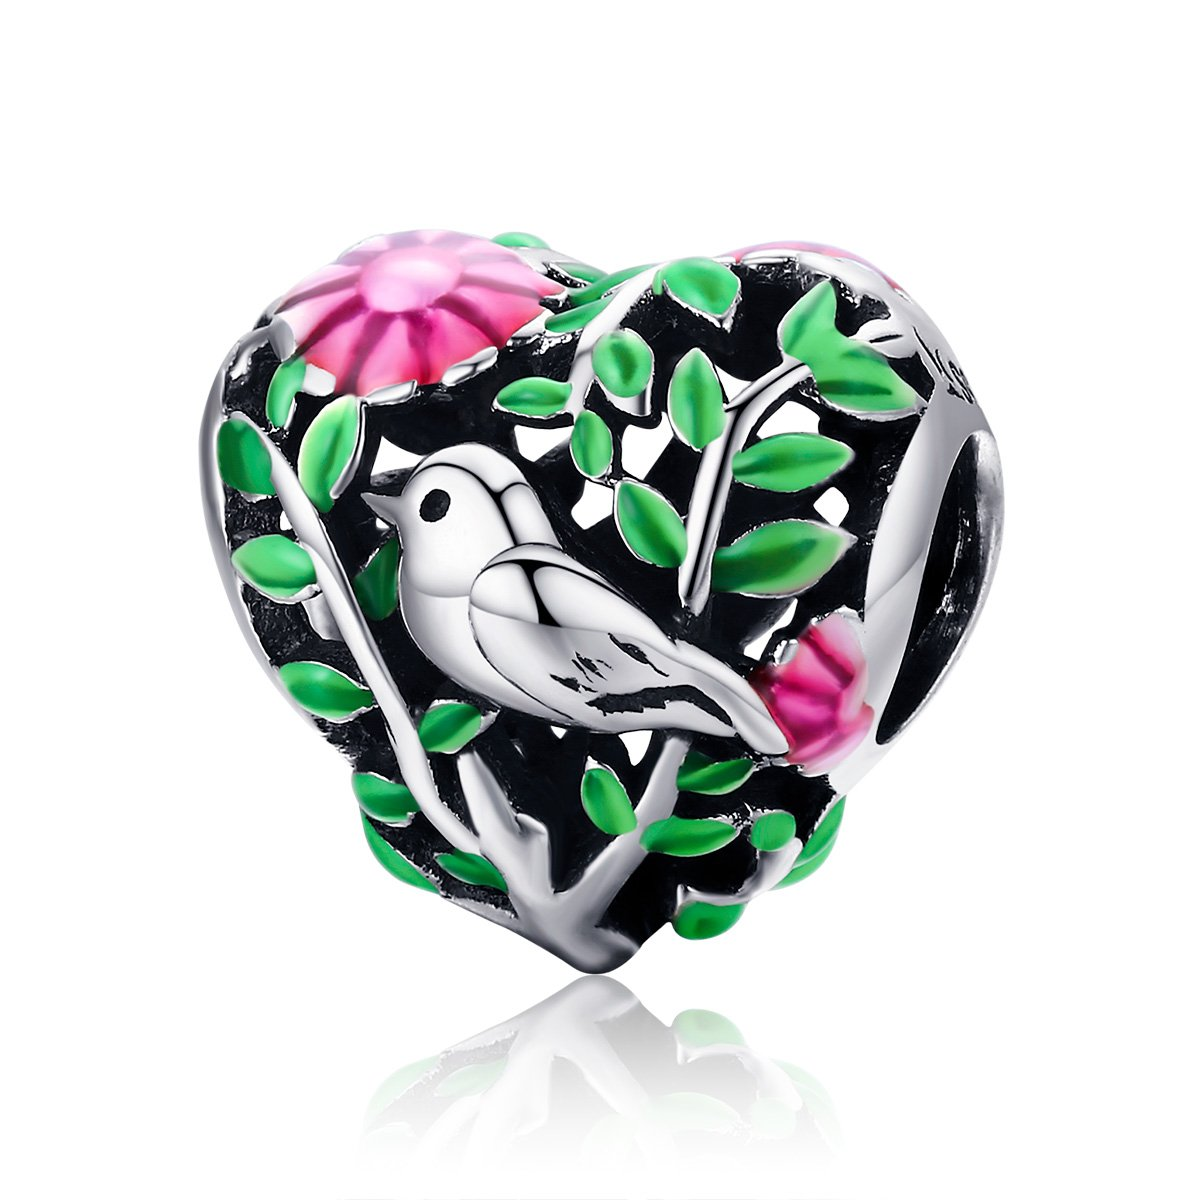 Everbling Bird in the Woods Enamel 925 Sterling Silver Bead Fits European Charm Bracelet EBYZYSCC647